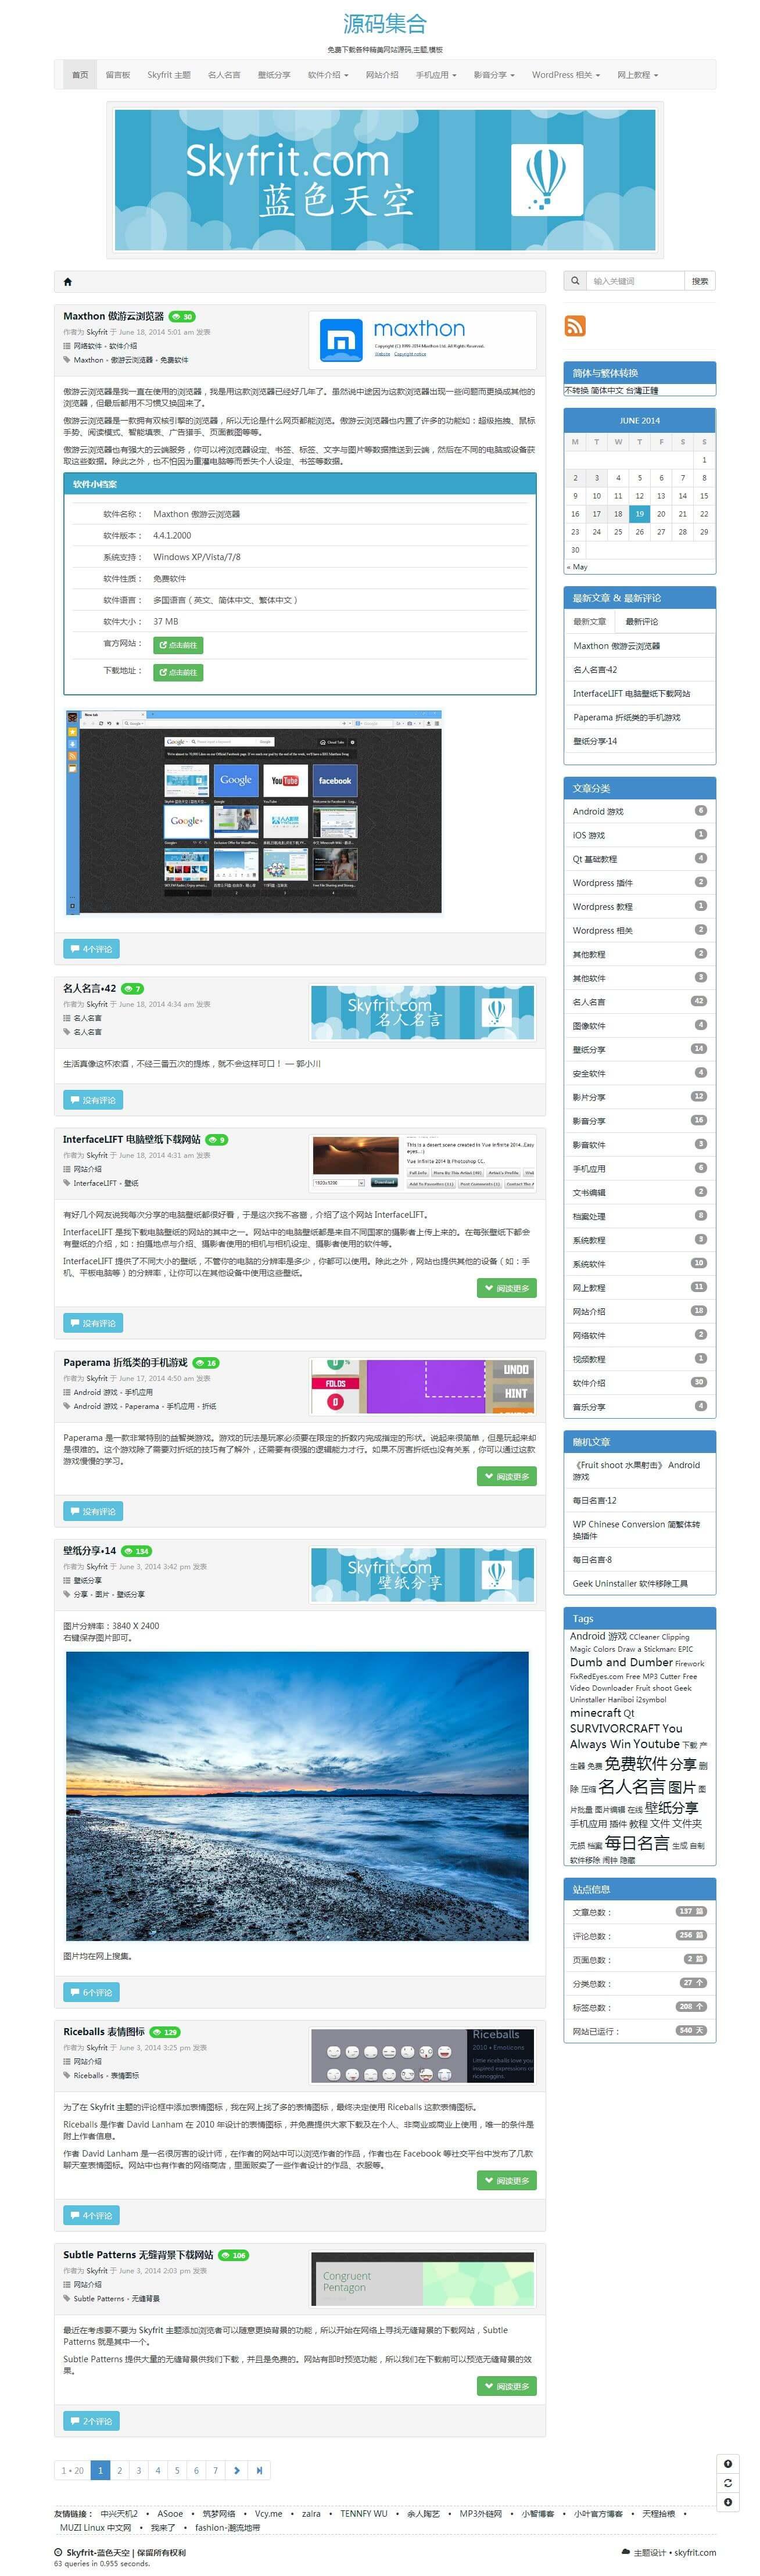 WordPress博客主题:响应式Skyfrit双栏主题分享